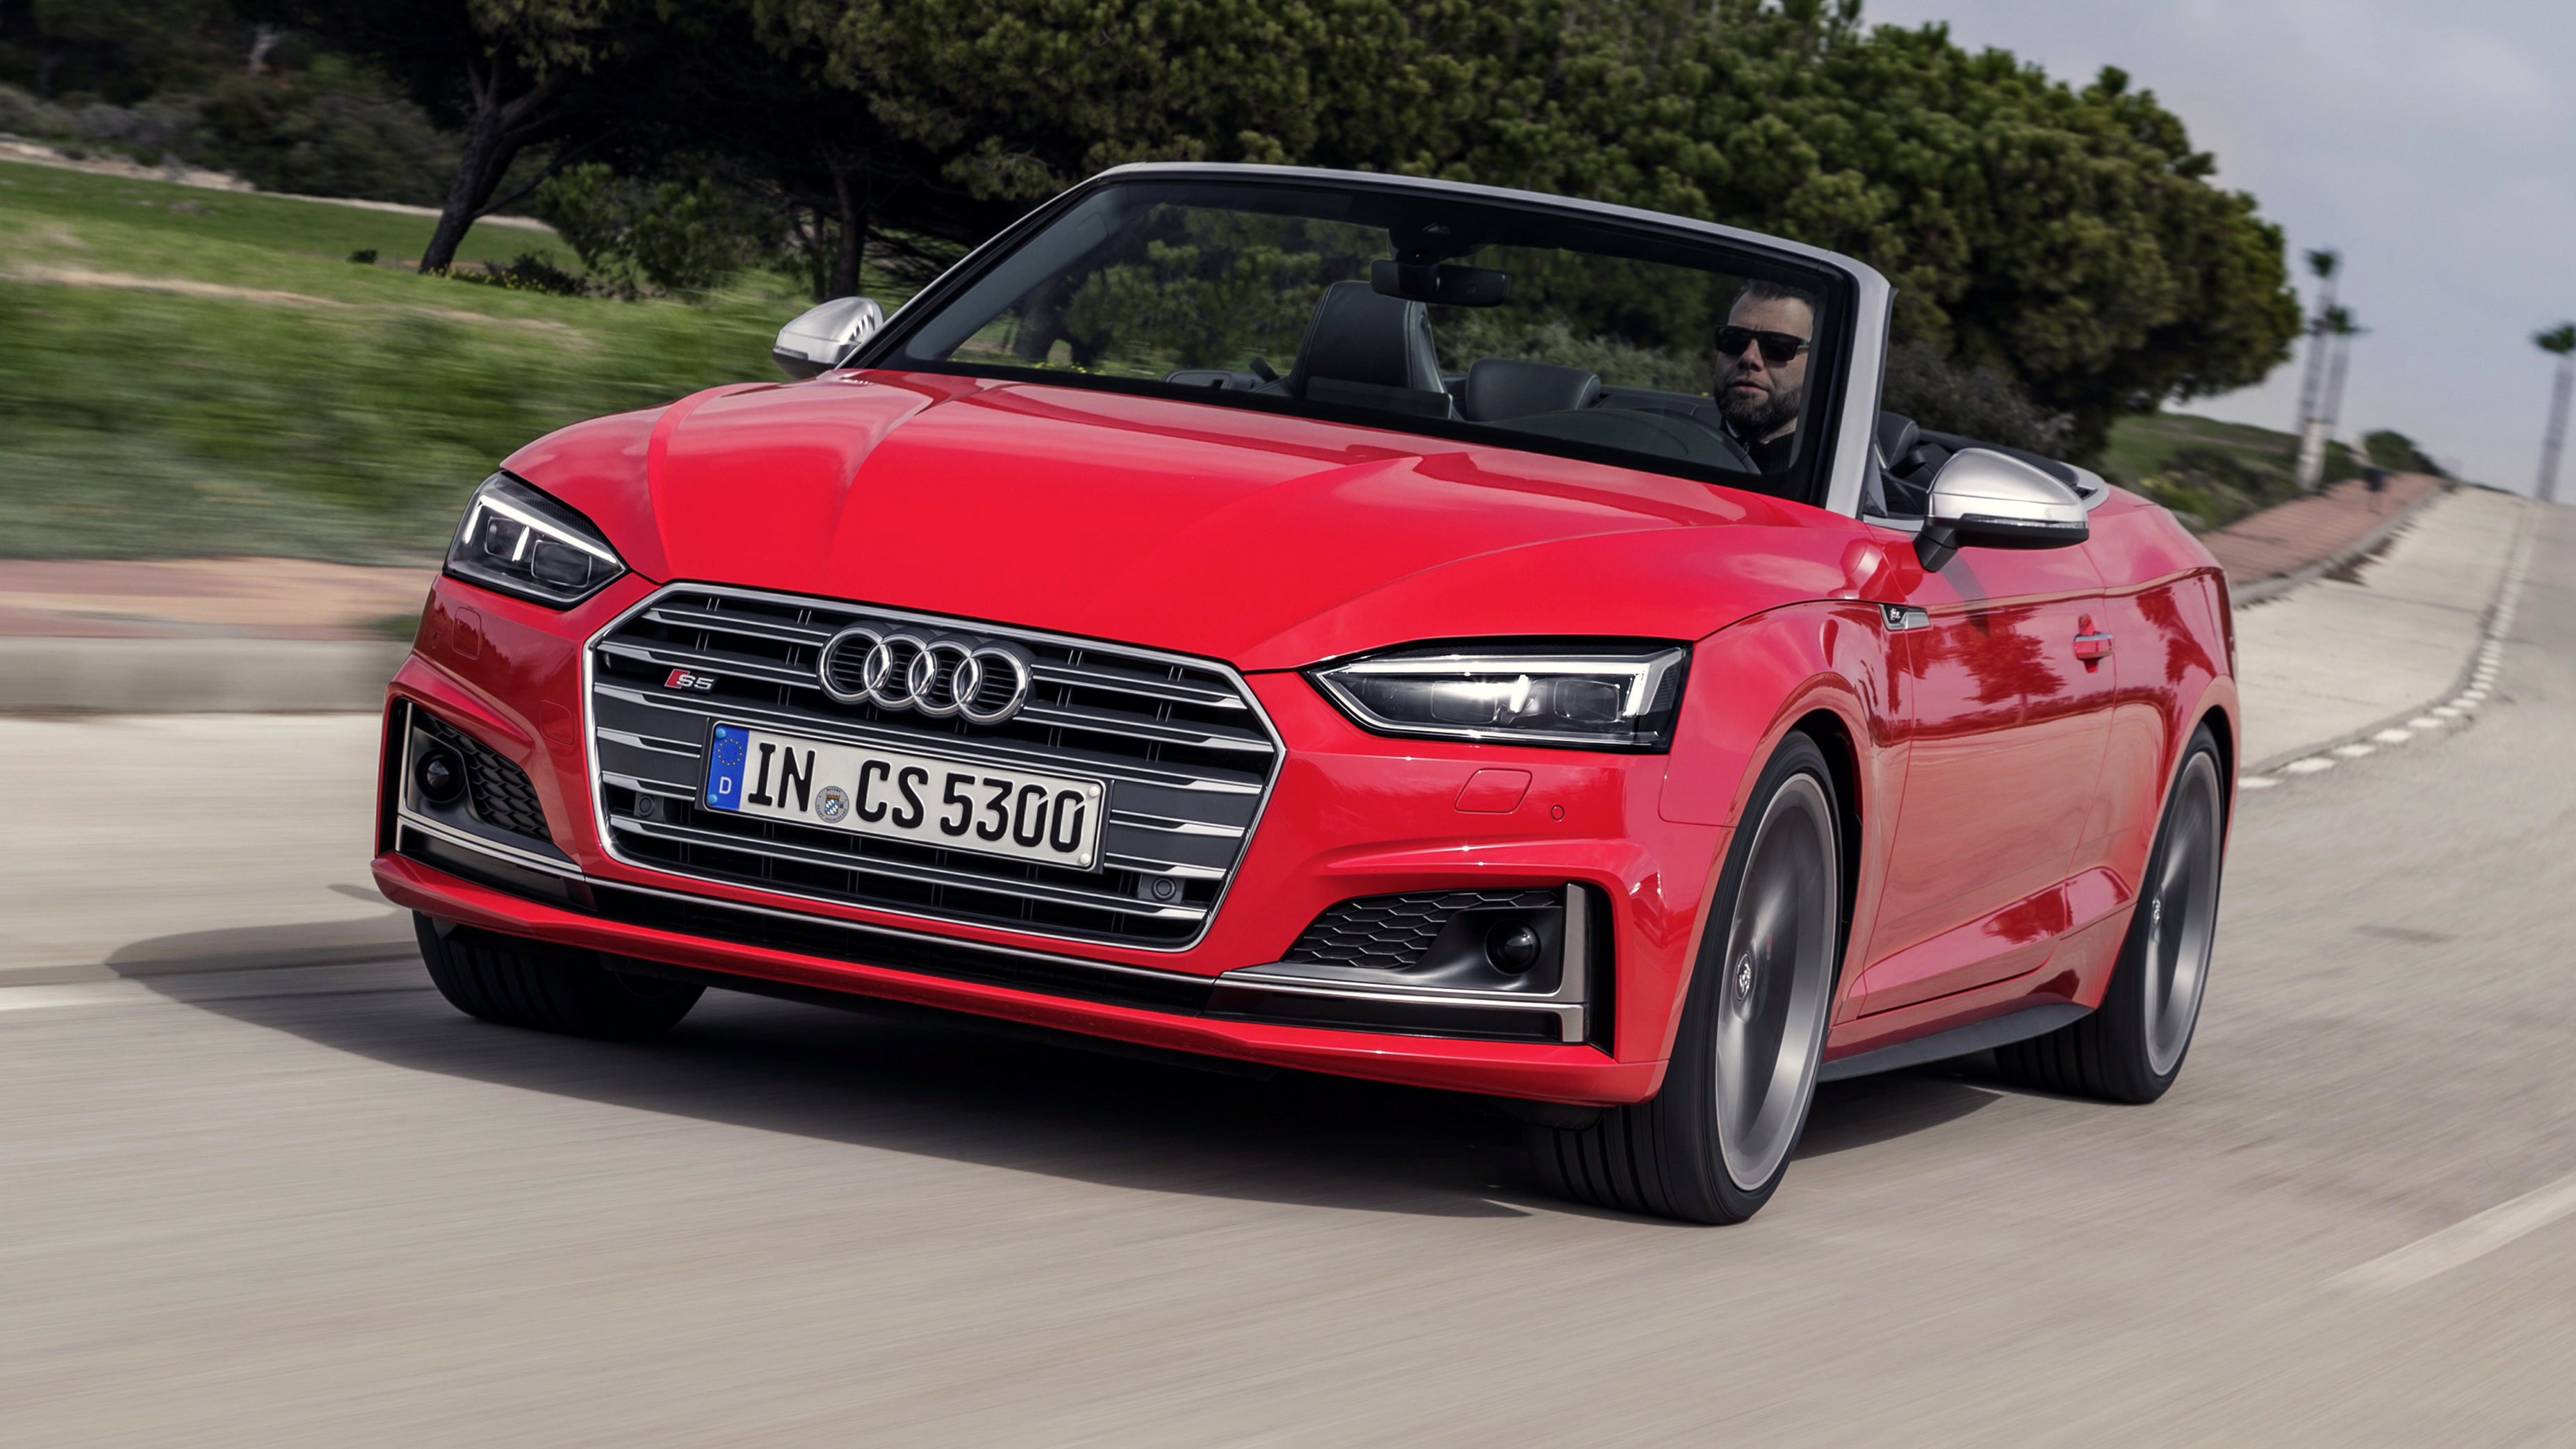 Audi S5 Cabriolet Review Quick V6 Cabrio Driven 2017 2018 Top Gear